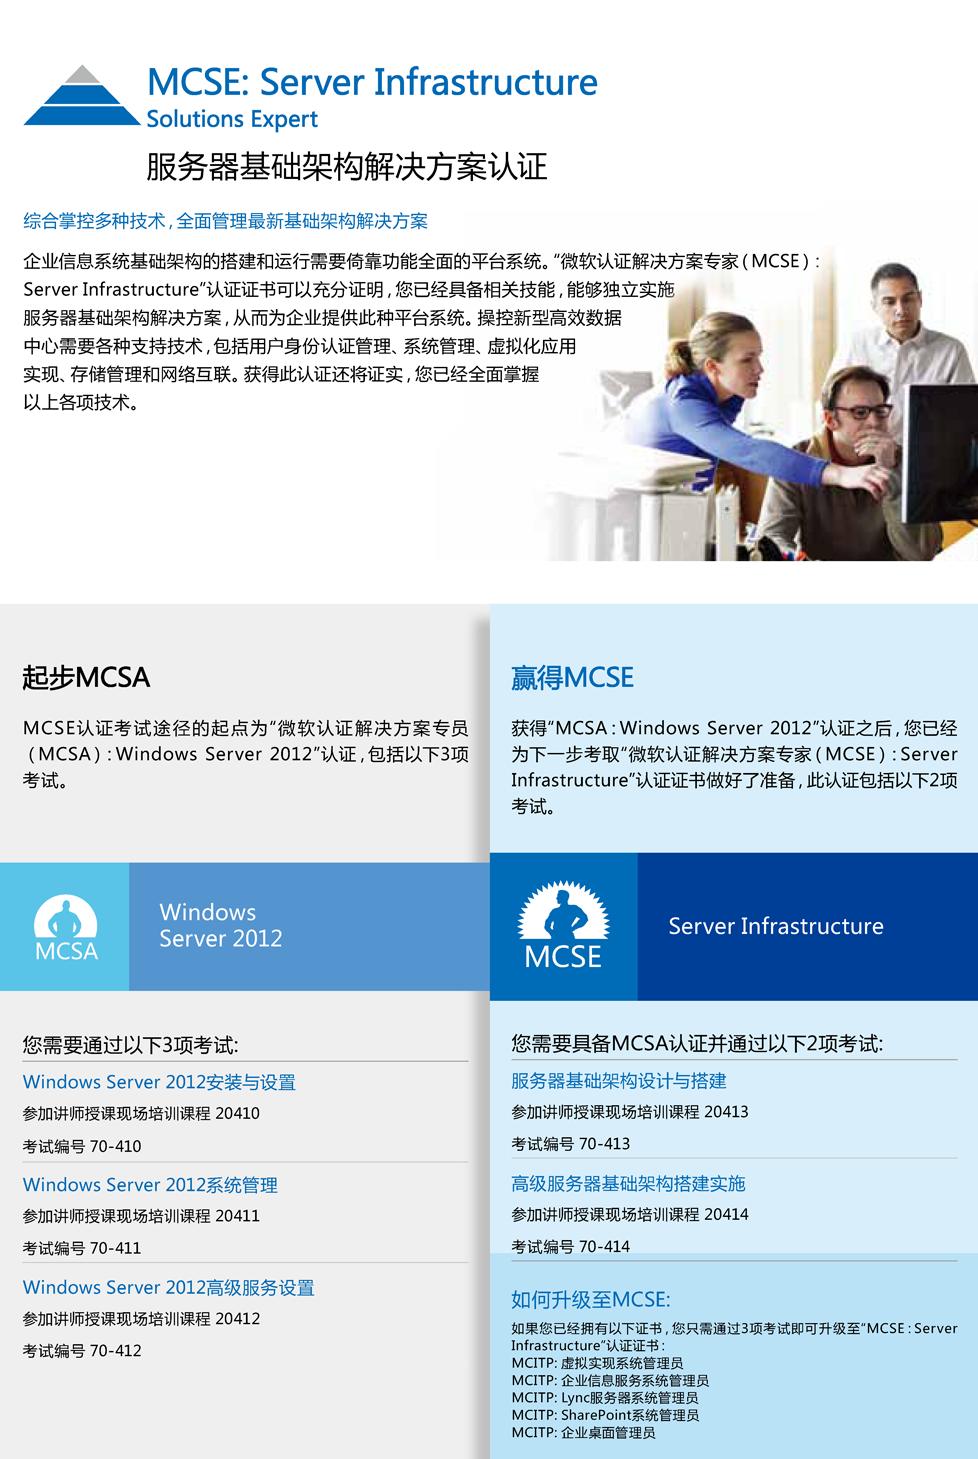 mcse-server-infrastructure-certification